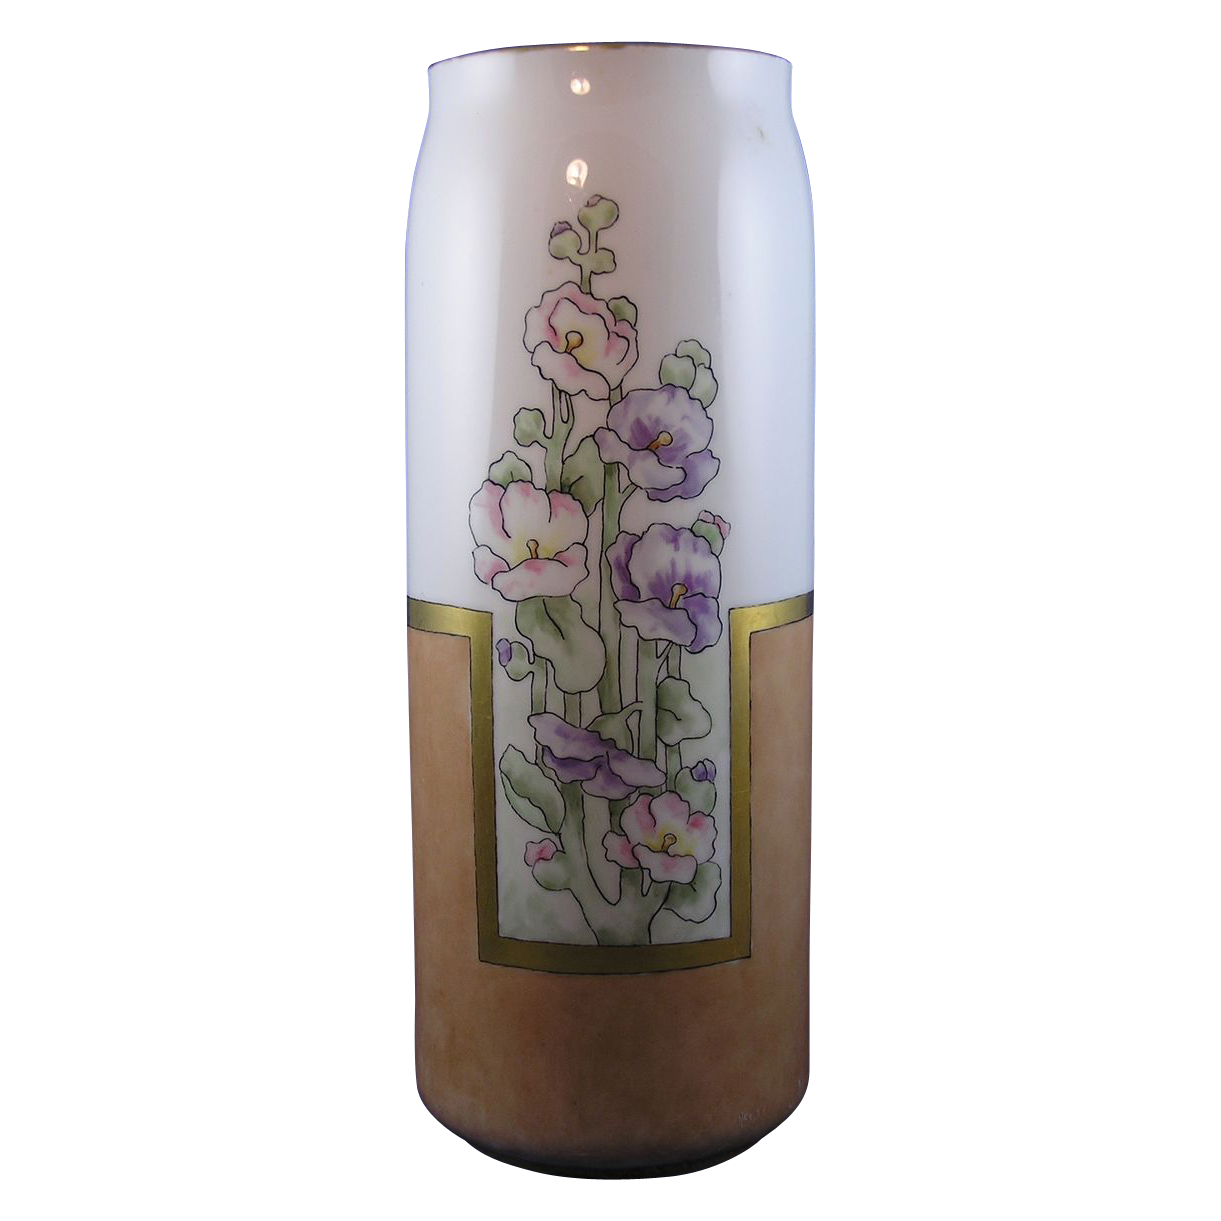 Moritz Zdekauer (MZ) Austria Arts & Crafts Hollyhock Motif Vase (Signed/c.1884-1909)